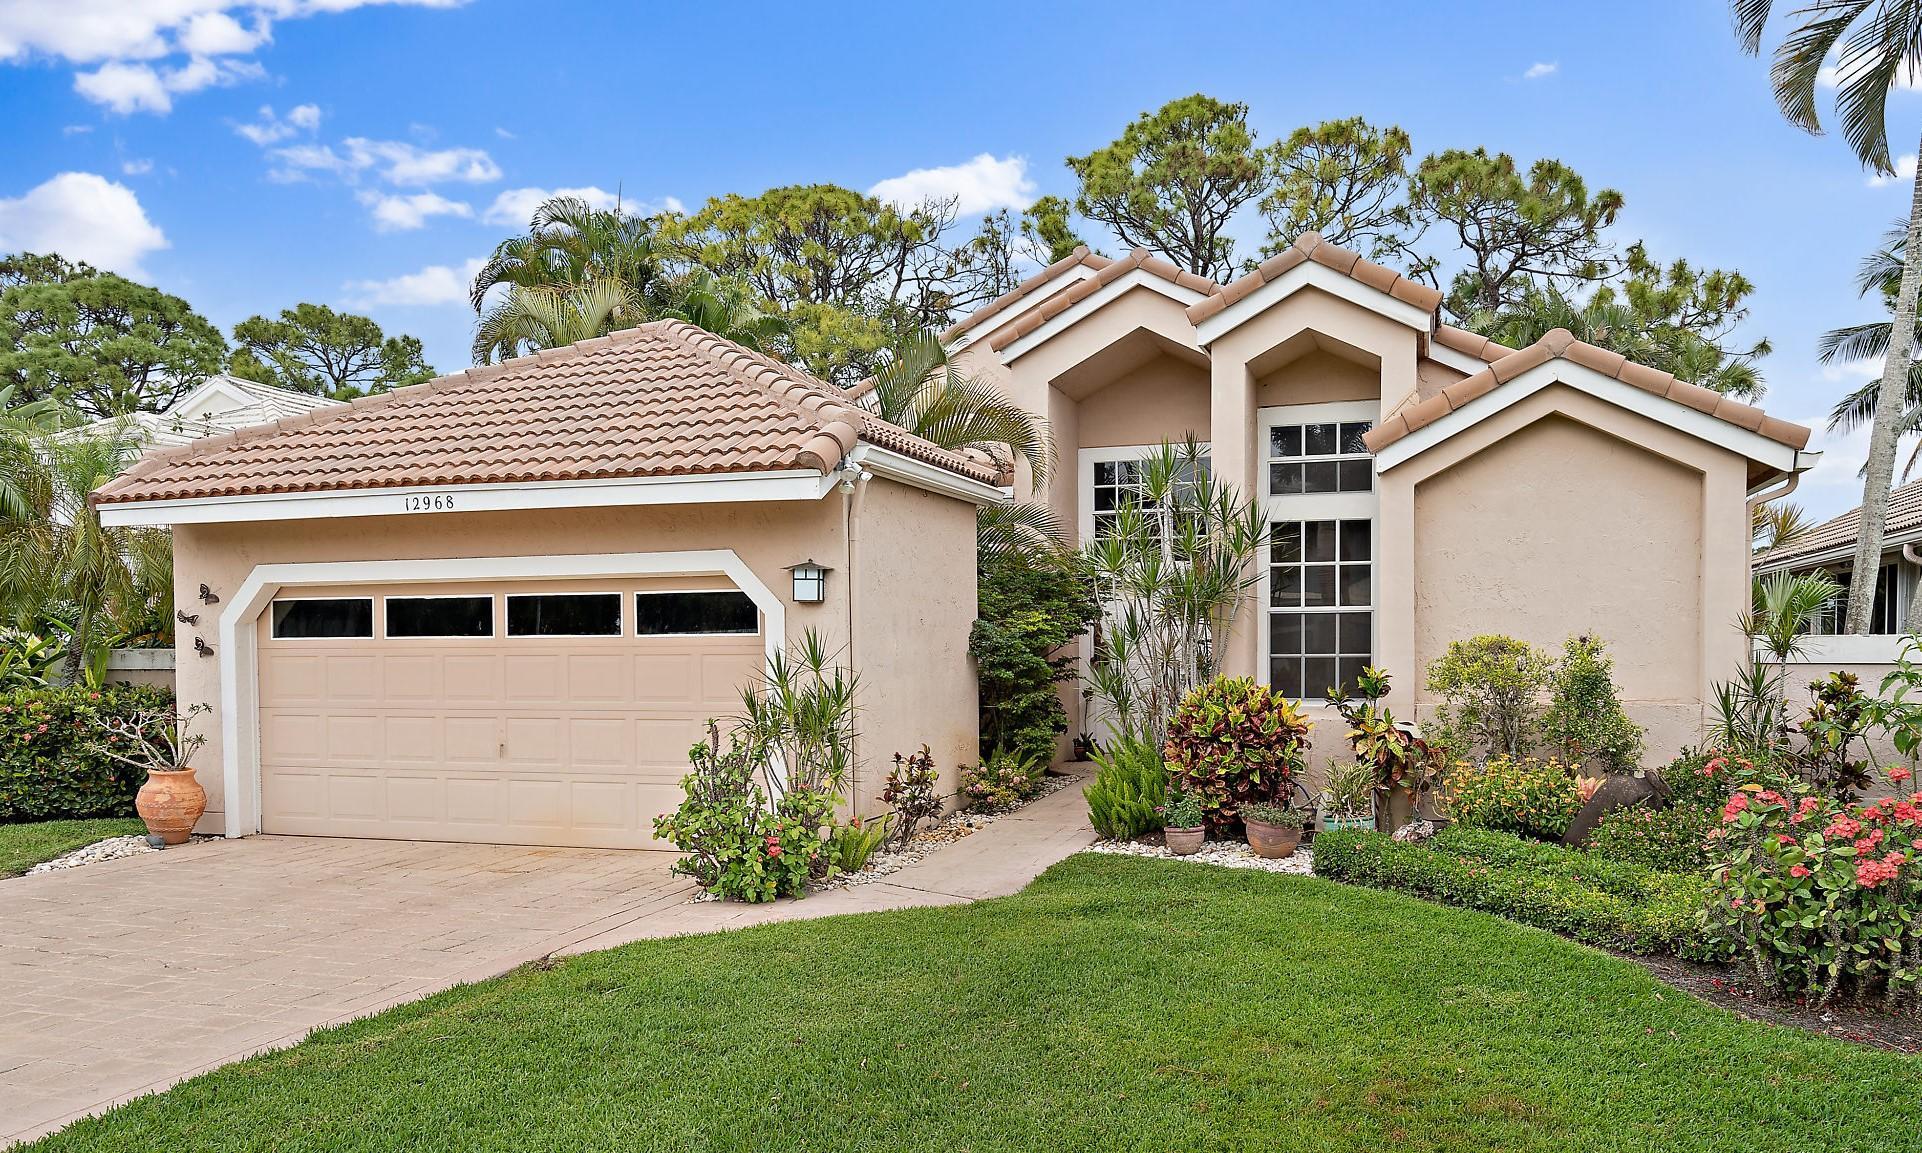 Photo of 12968 Touchstone Place, Palm Beach Gardens, FL 33418